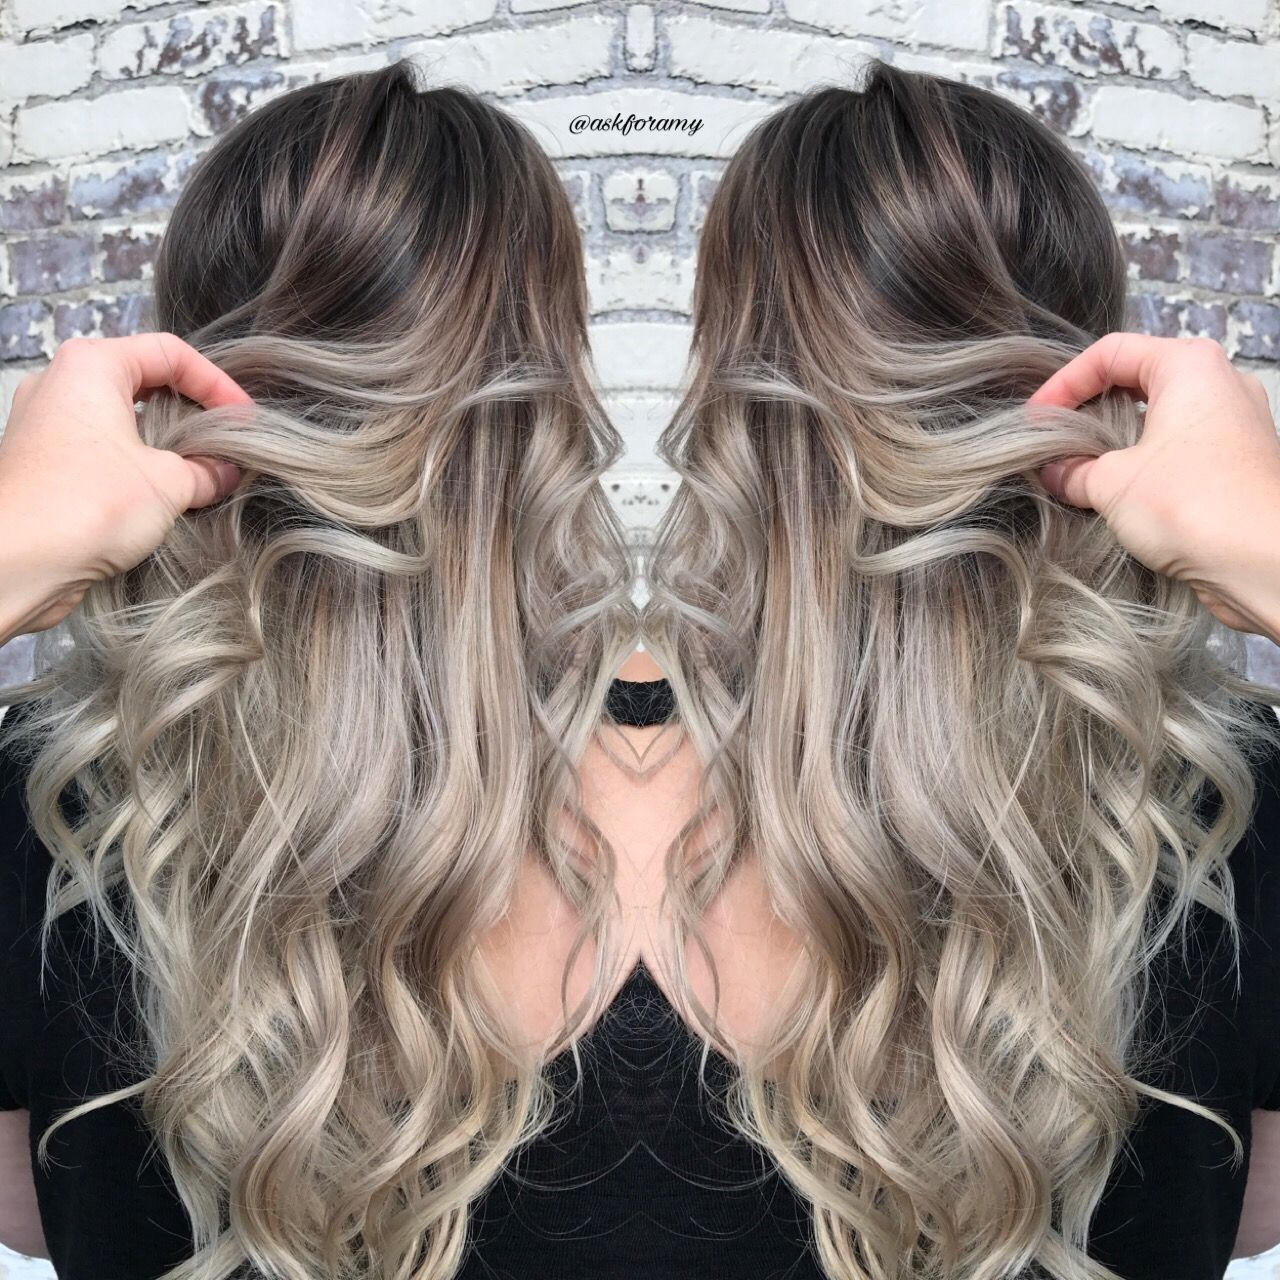 Ash Blonde Platinum Hair With Dark Roots By Askforamy Dark Roots Blonde Hair Light Ash Blonde Hair Ash Blonde Balayage Dark